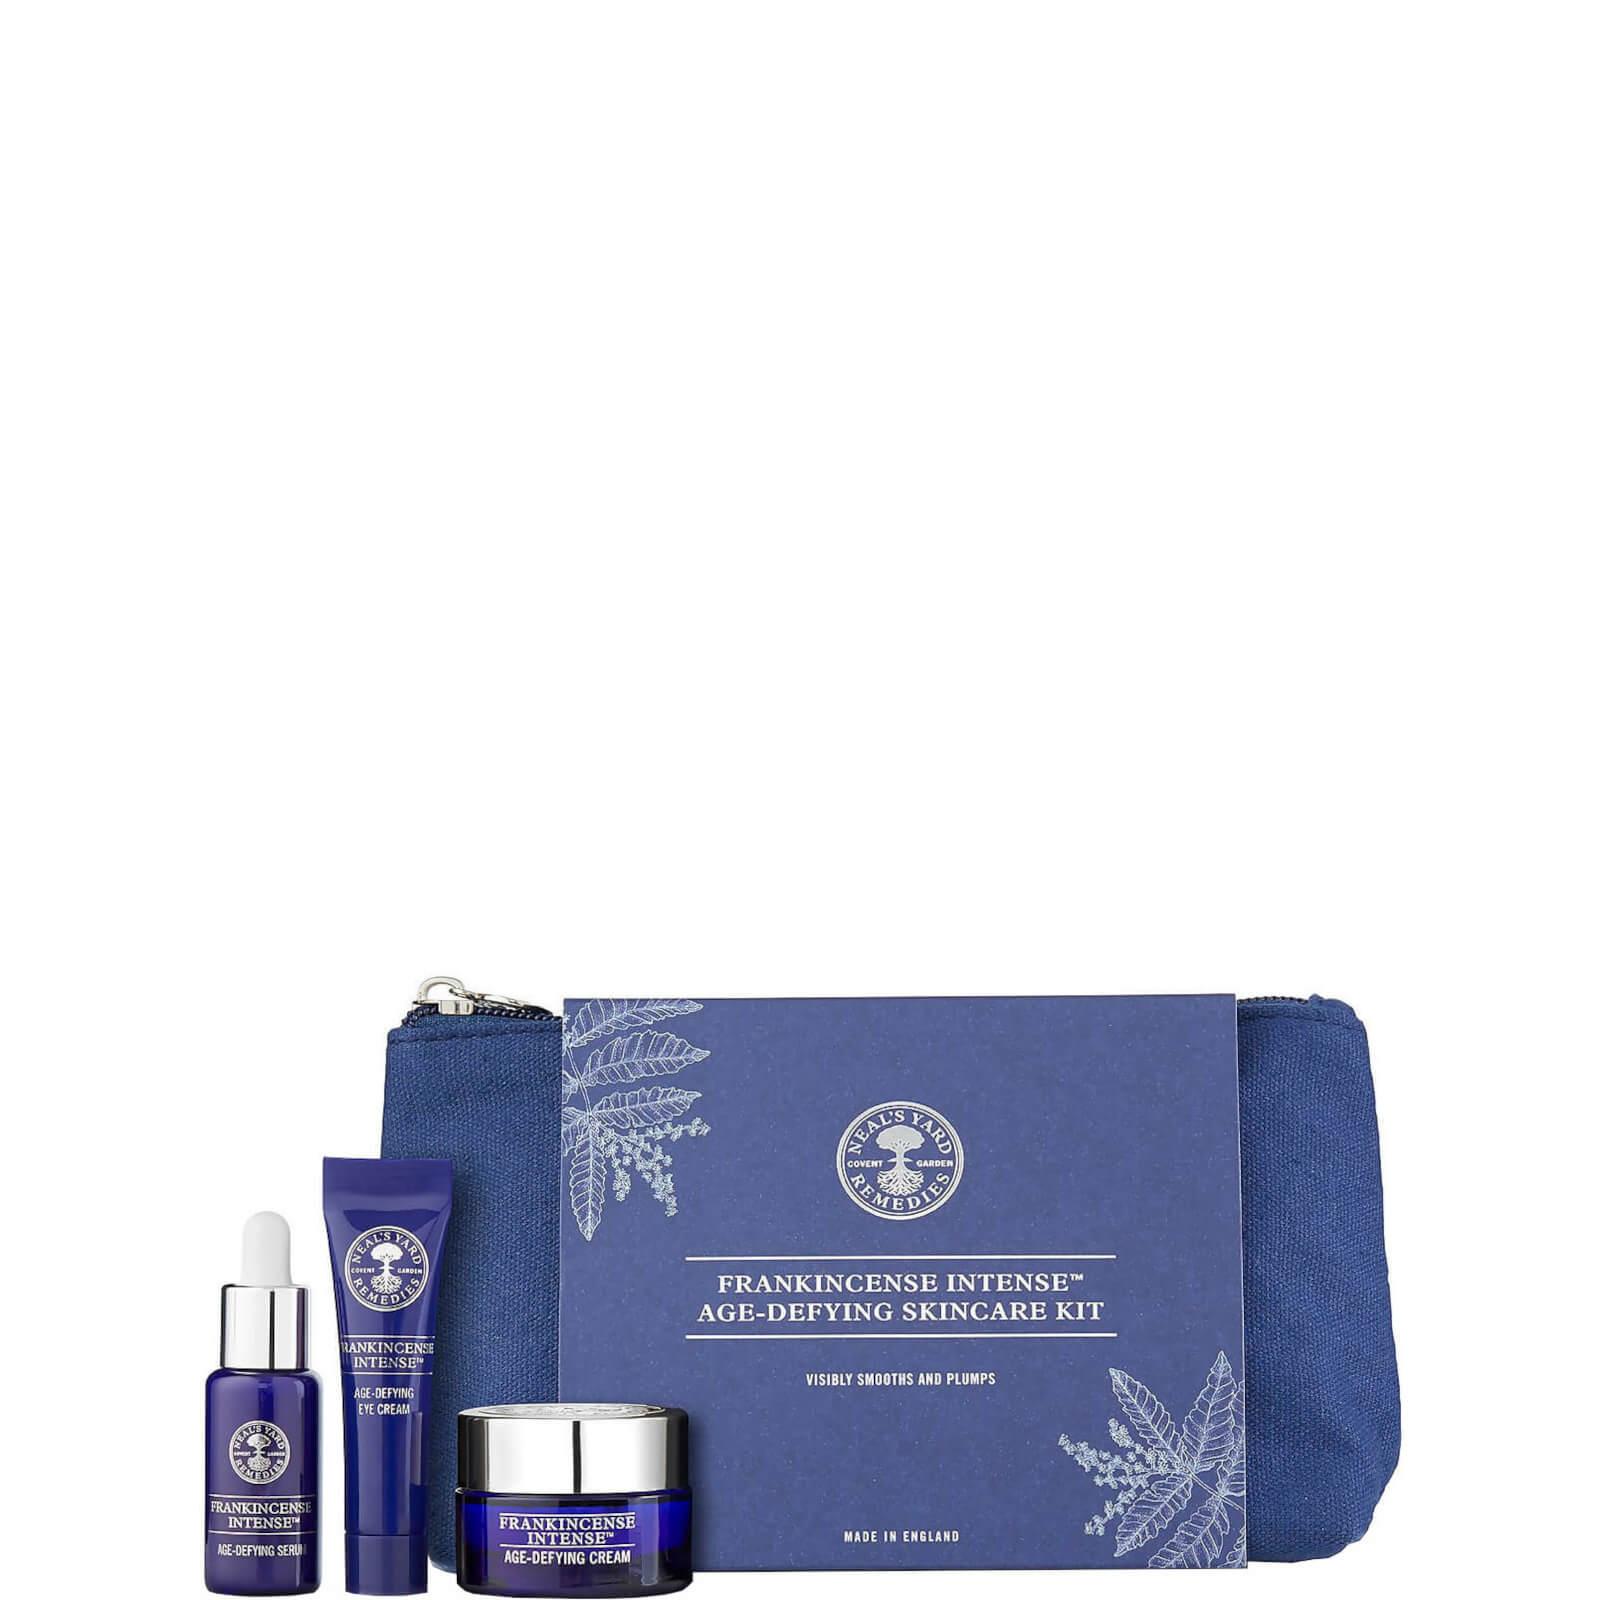 Neal's Yard Remedies Frankincense Intense™ Age-Defying Skincare Kit